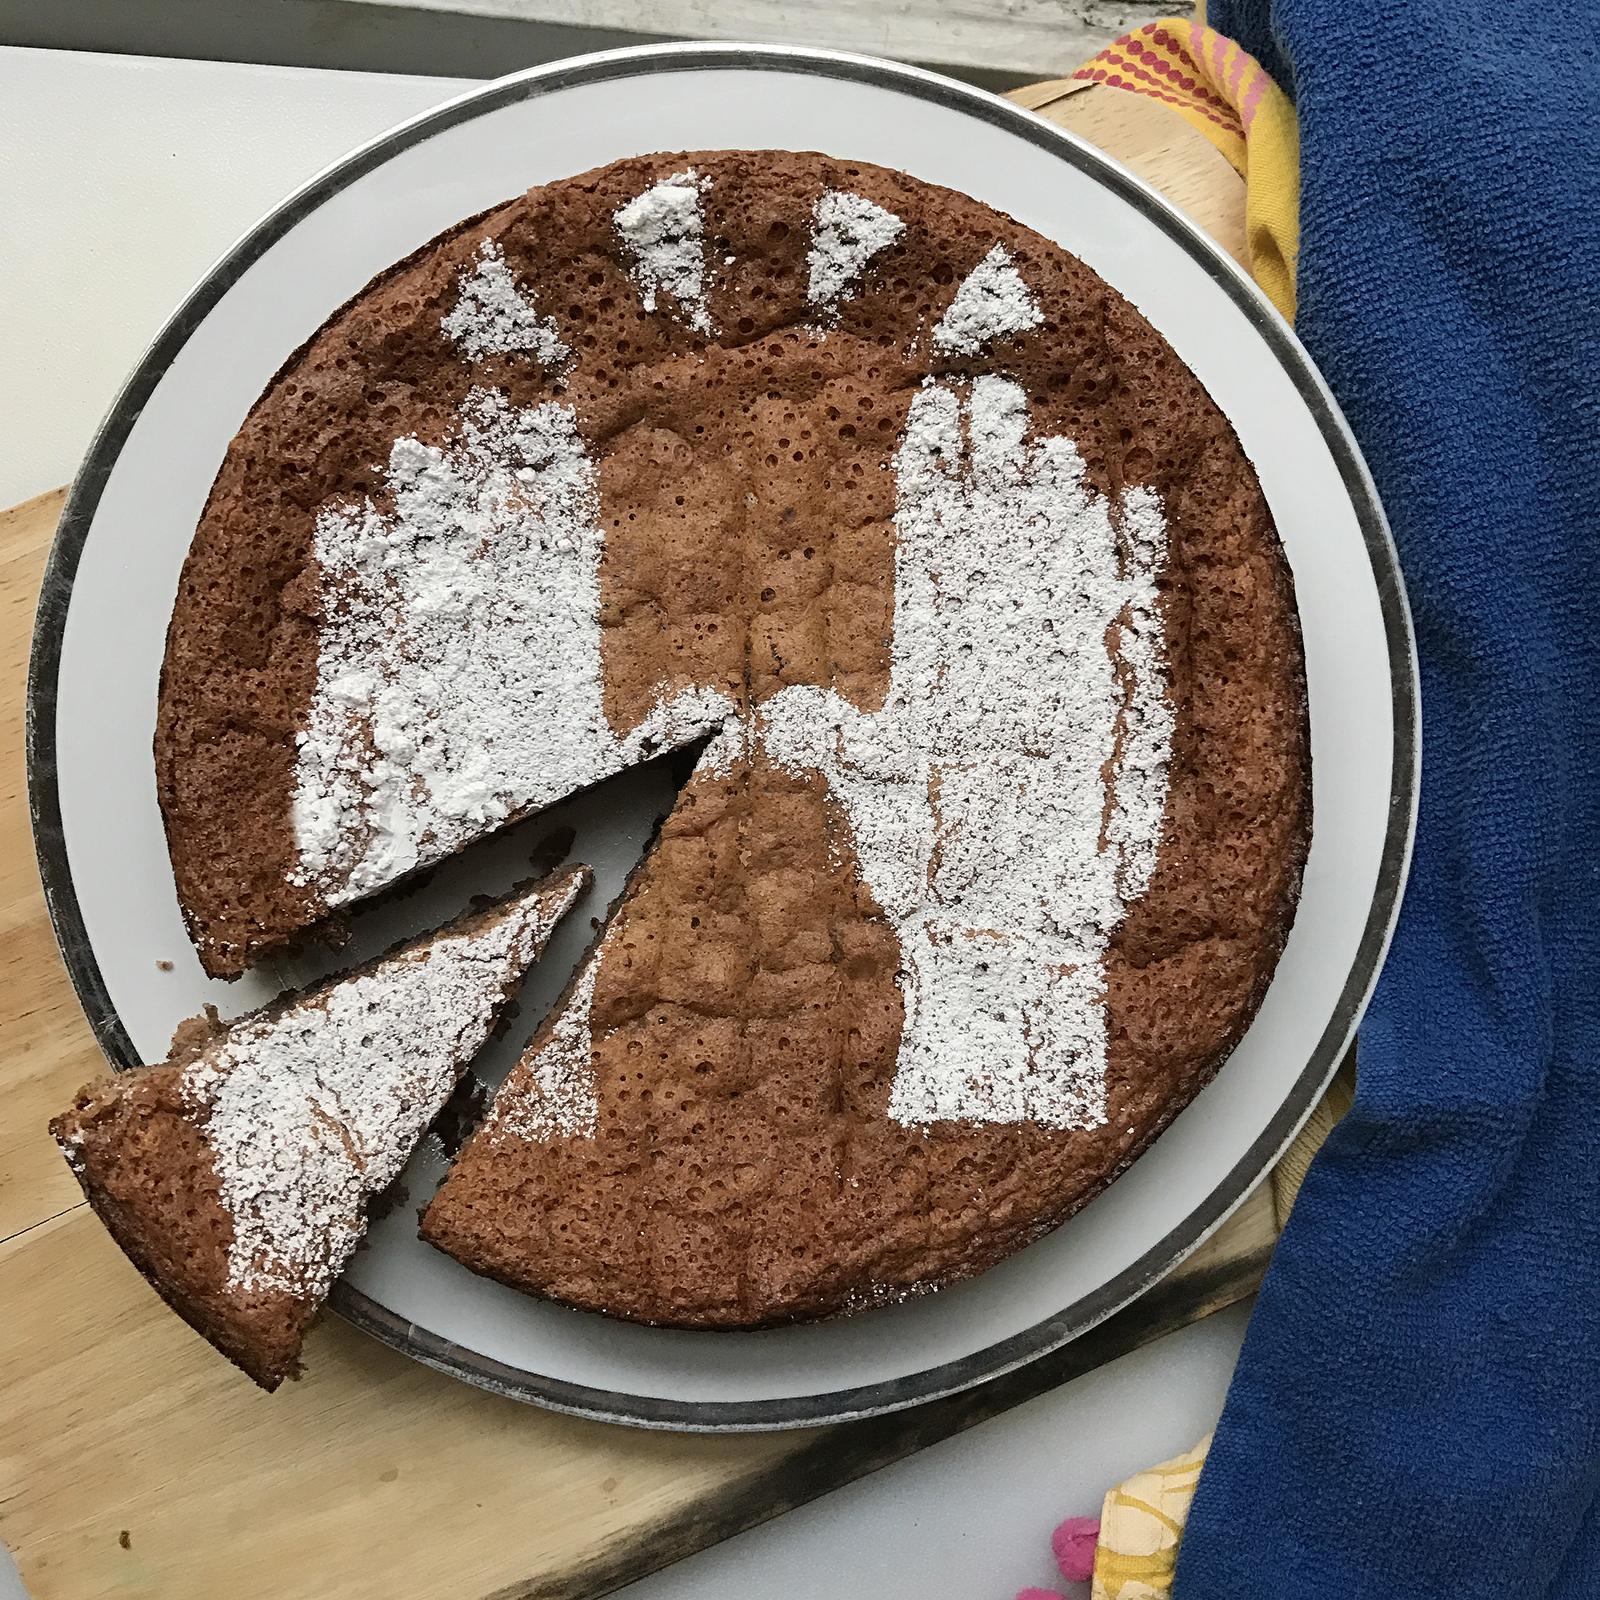 Recipe: Torta Siciliana with Almonds, Hazelnuts, and Walnuts